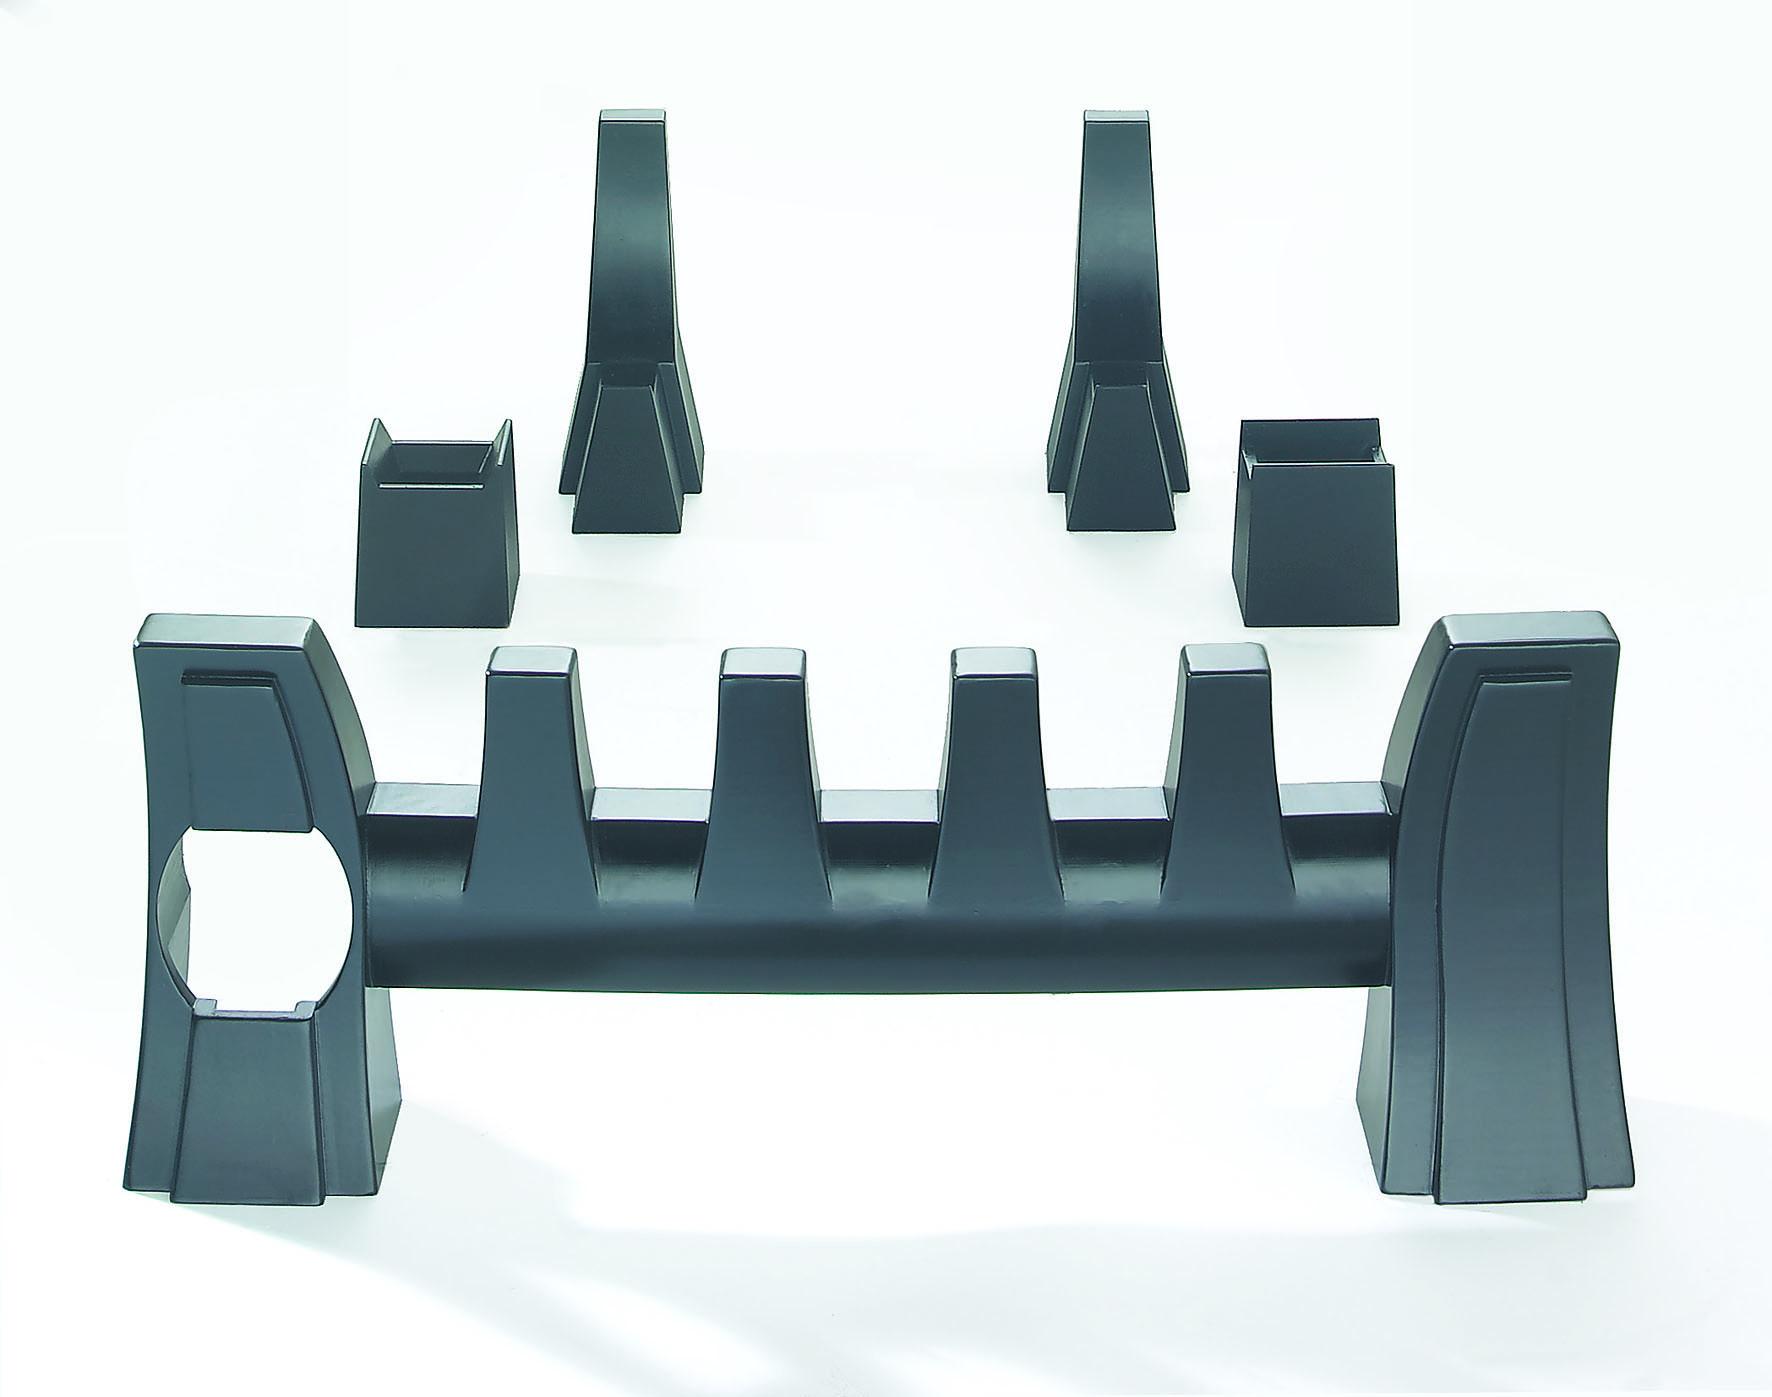 acheter support pare buches pour equatair kit d co confort domo. Black Bedroom Furniture Sets. Home Design Ideas